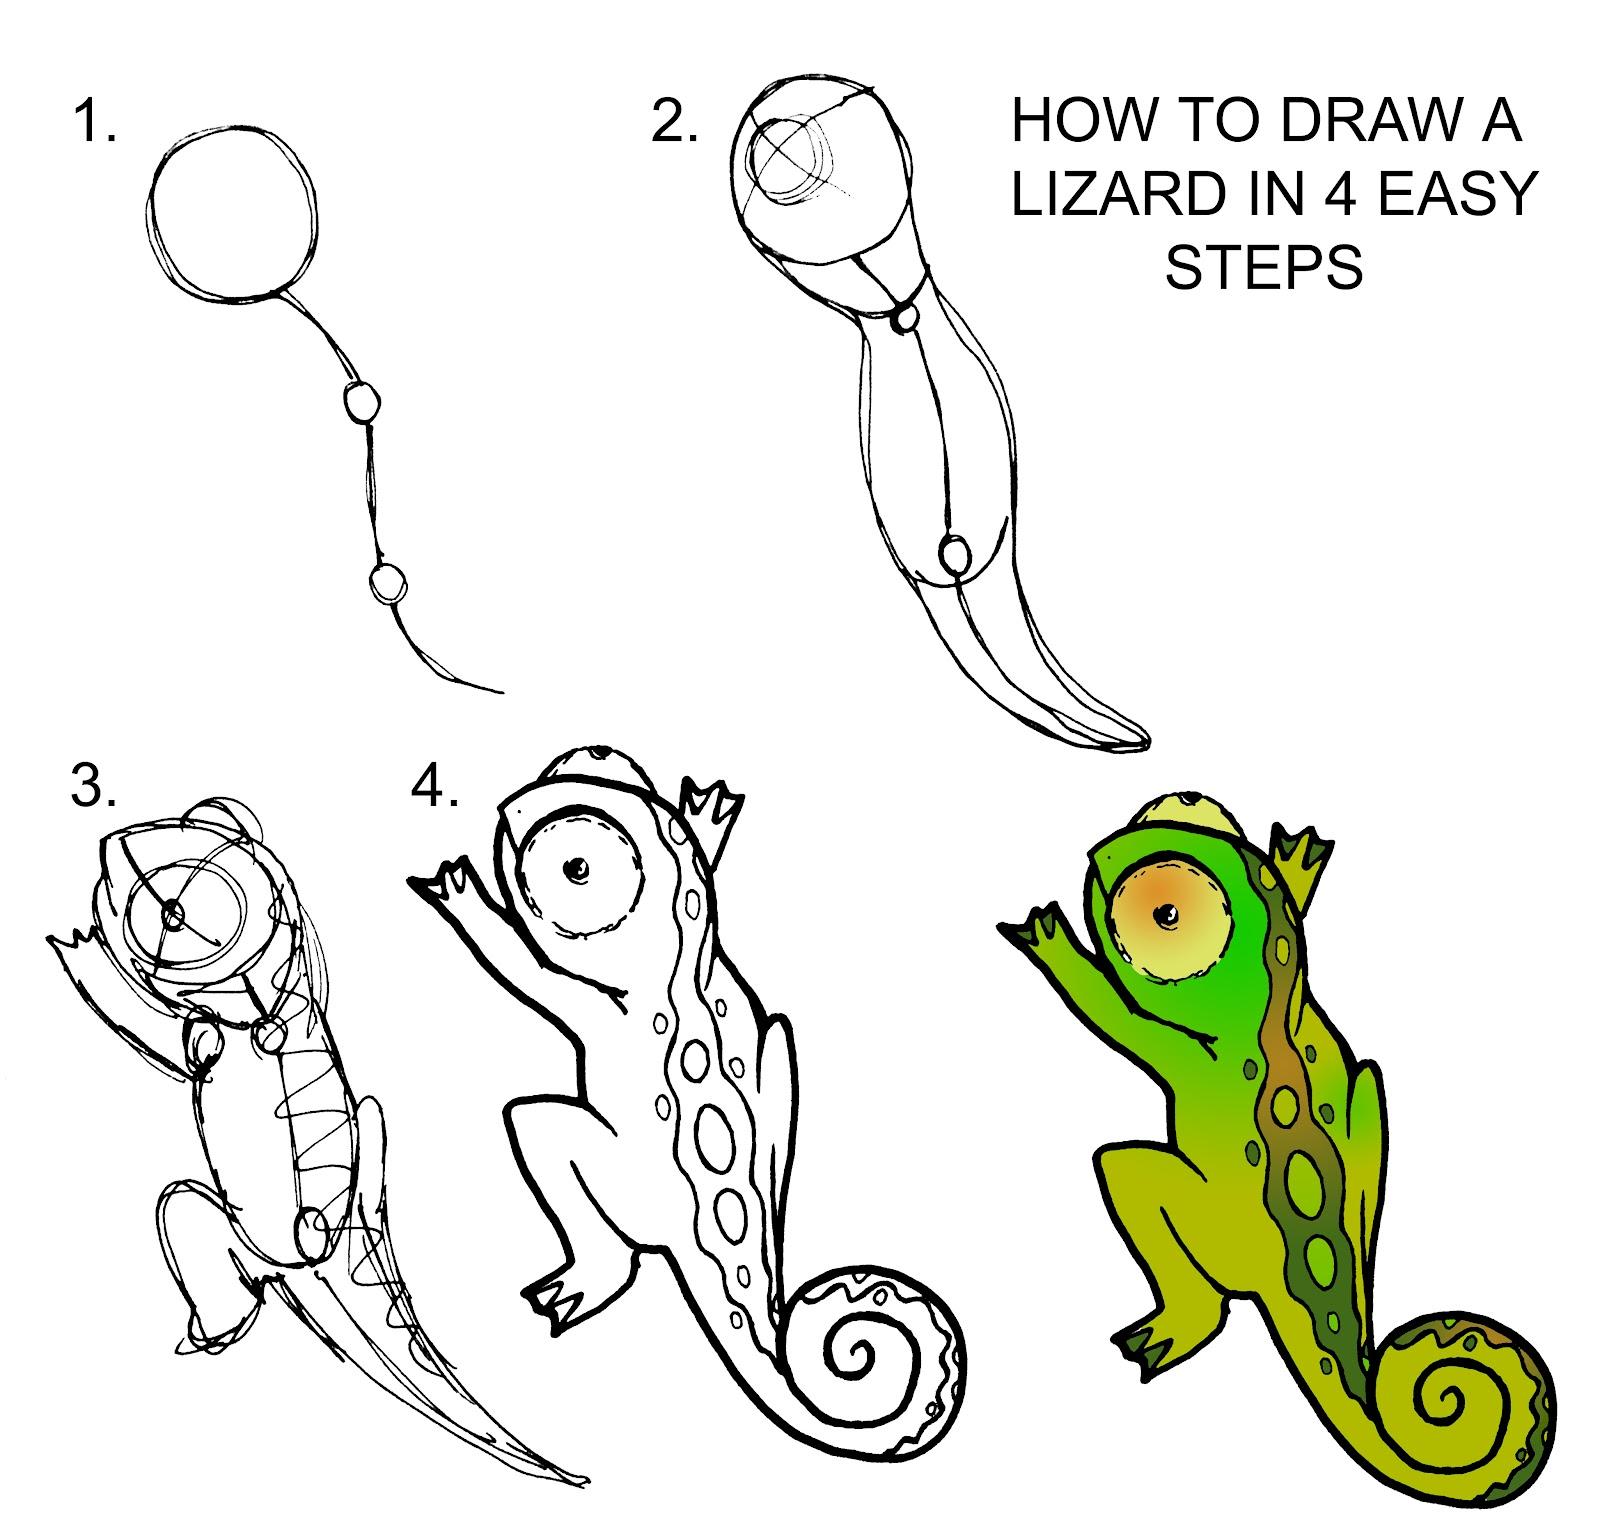 Drawn reptile easy Lizards Simple Lizard drawings of